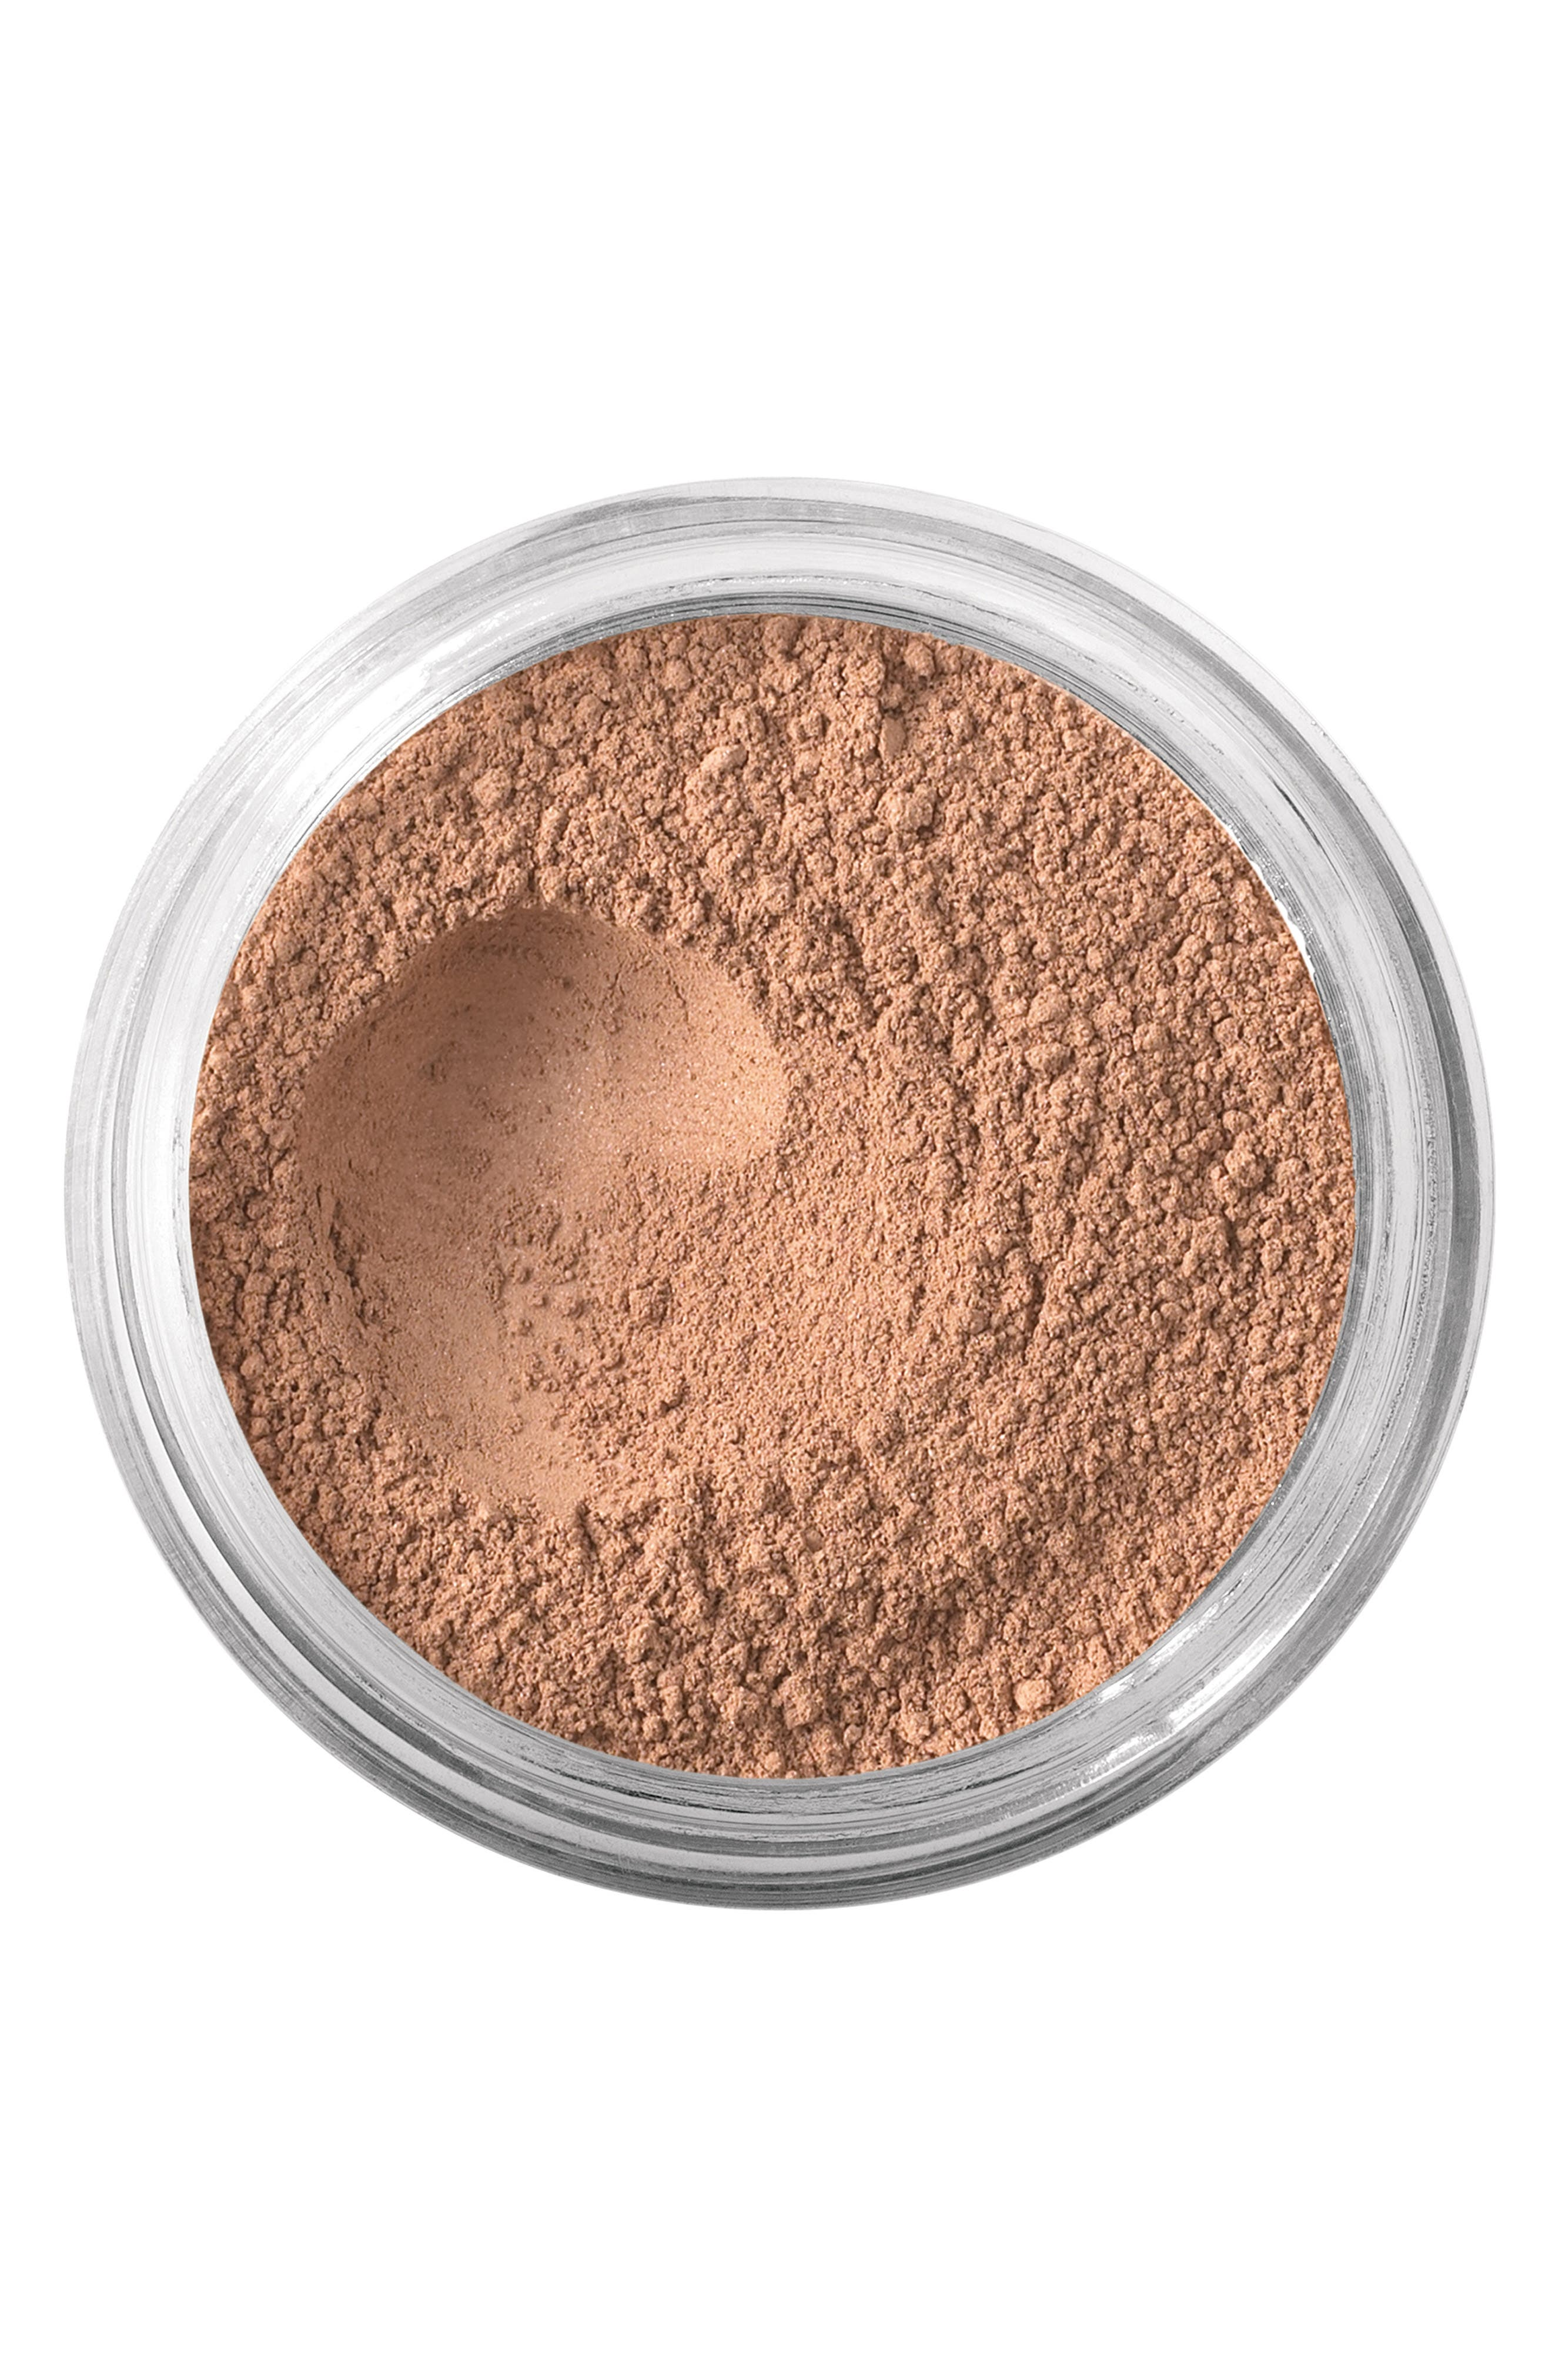 Bareminerals Multitasking Powder Concealer Spf 20